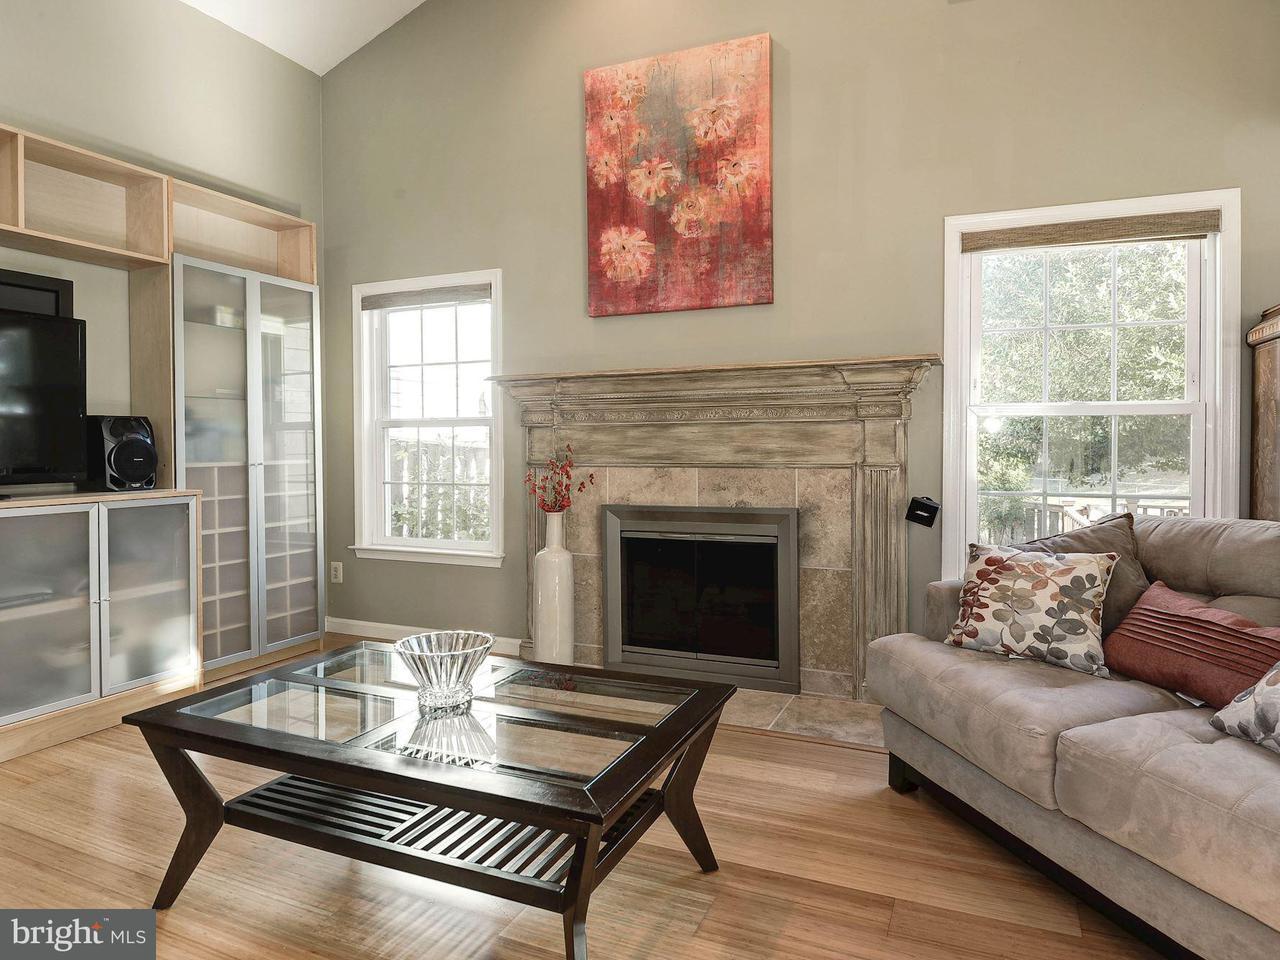 Single Family Home for Sale at 7532 CROSS GATE Lane 7532 CROSS GATE Lane Alexandria, Virginia 22315 United States